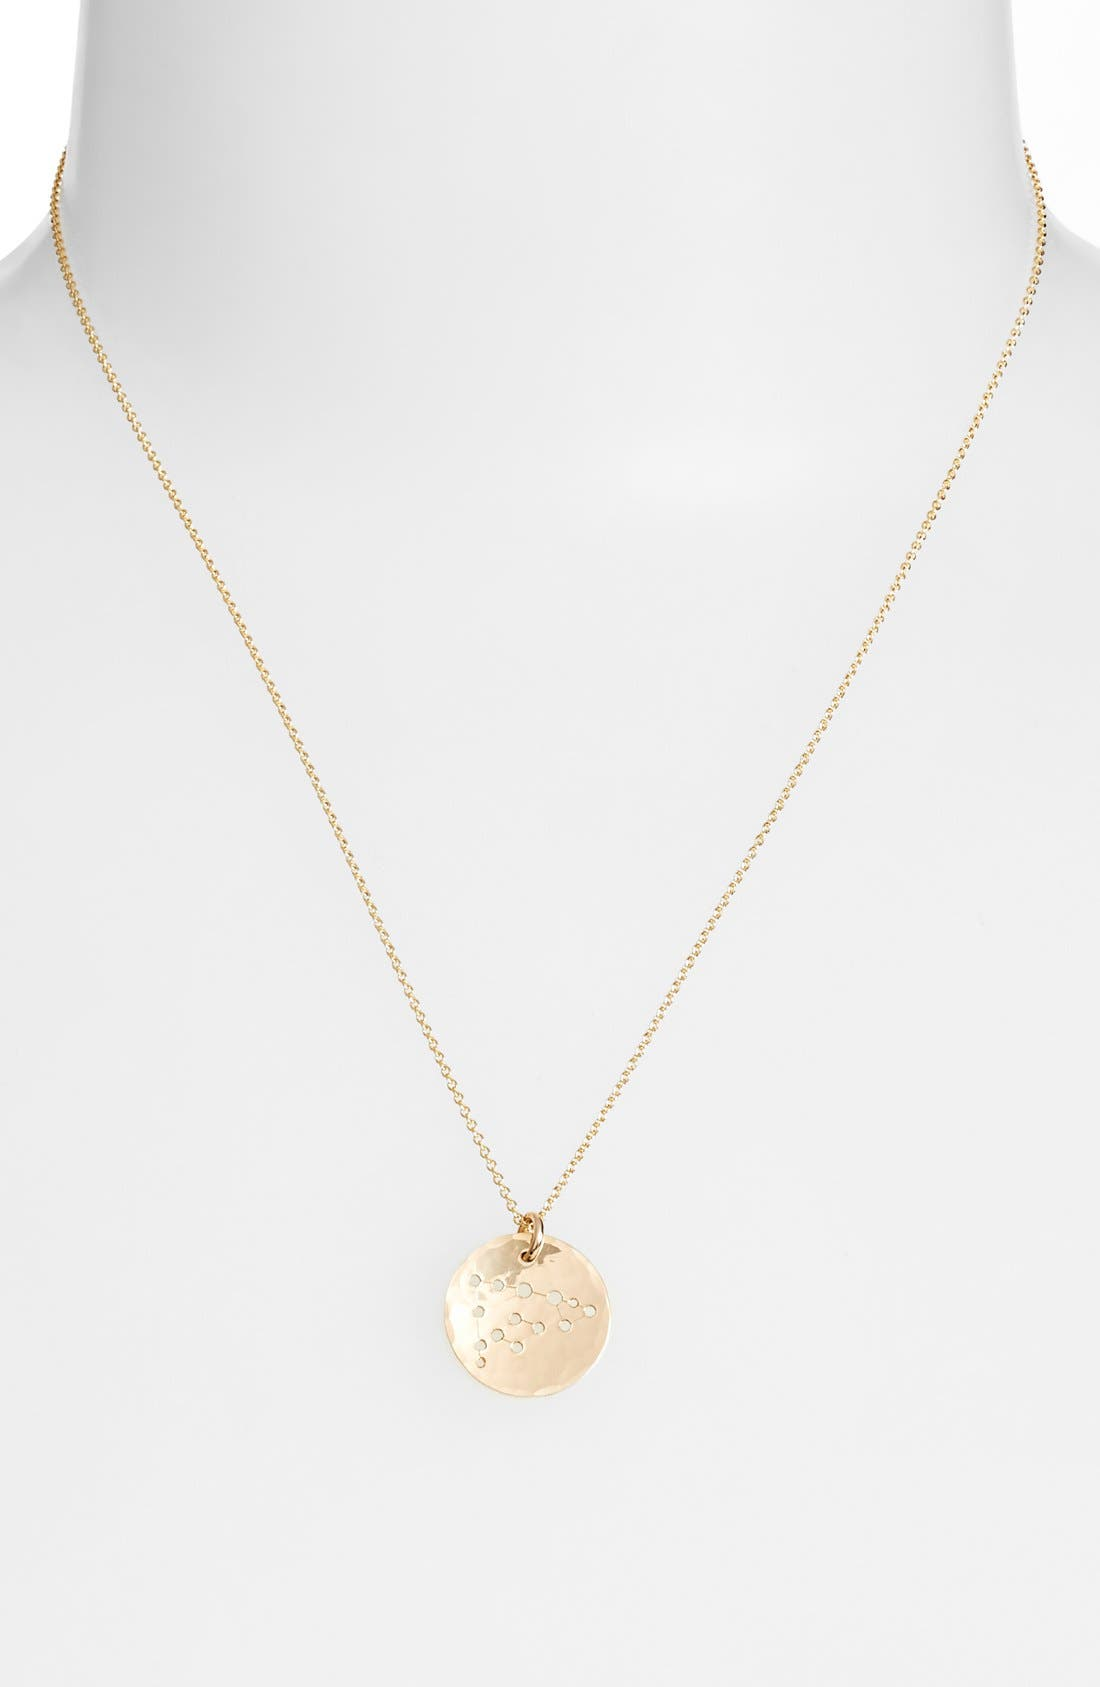 Ija 'Small Zodiac' 14k-Gold Fill Necklace,                             Alternate thumbnail 23, color,